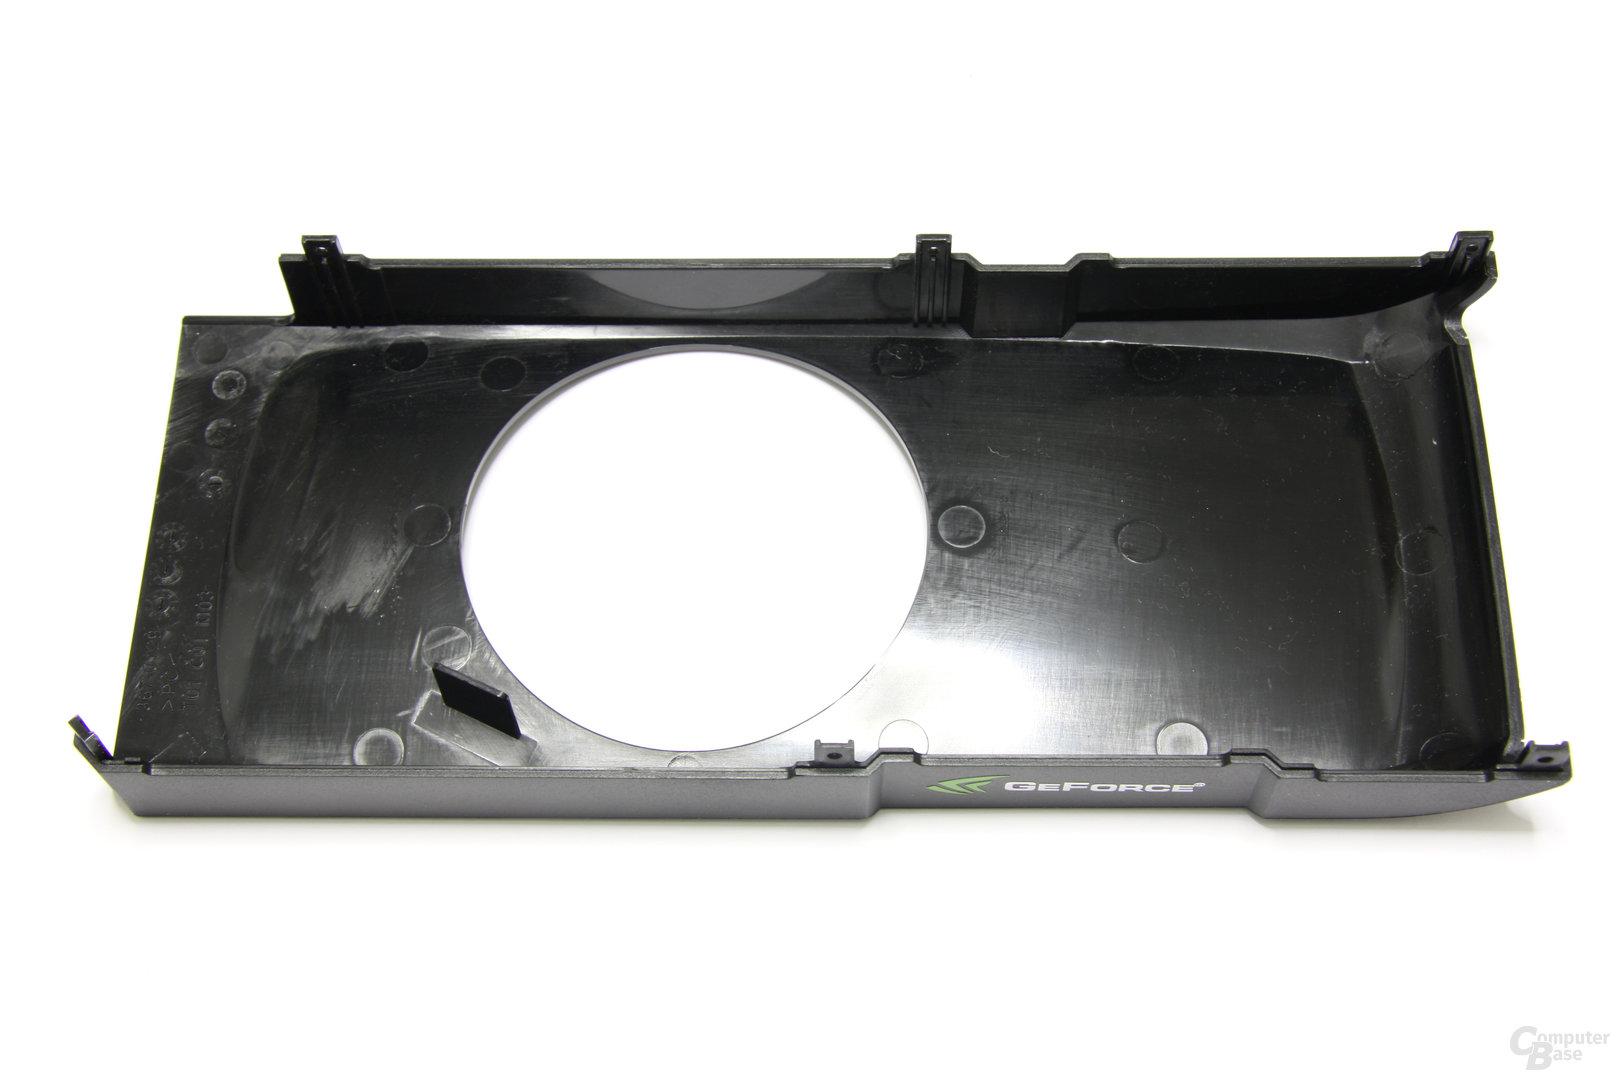 GeForce GTX 560 Ti Kühlerhaube